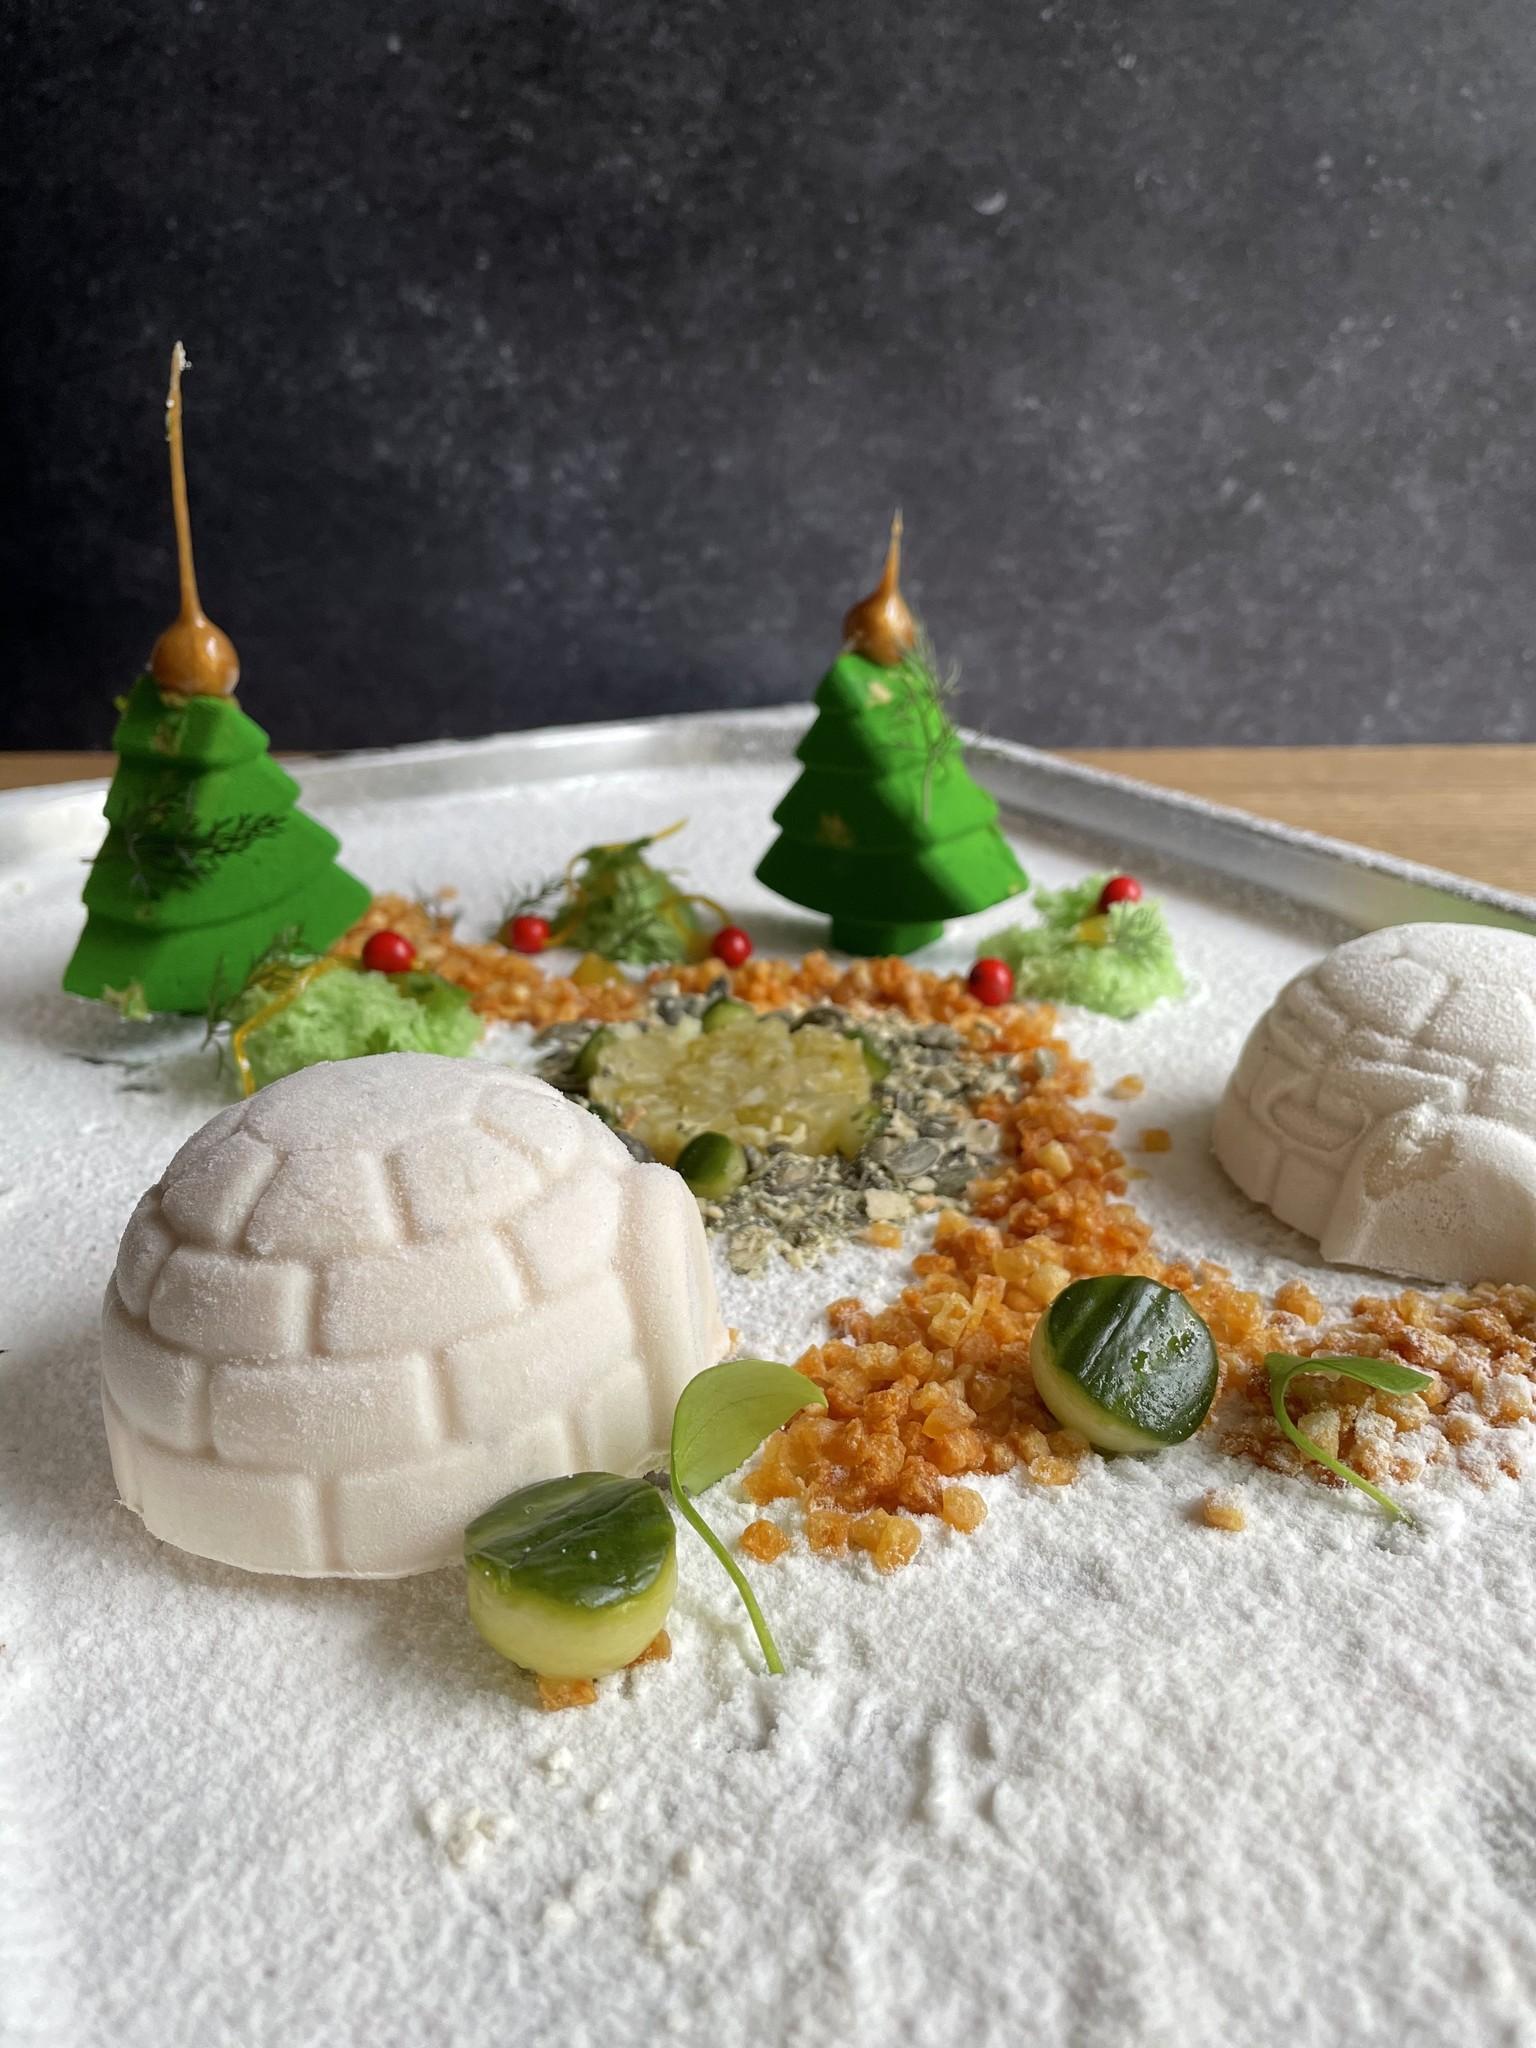 Kerstmenu vegetarisch 5 gangen-2